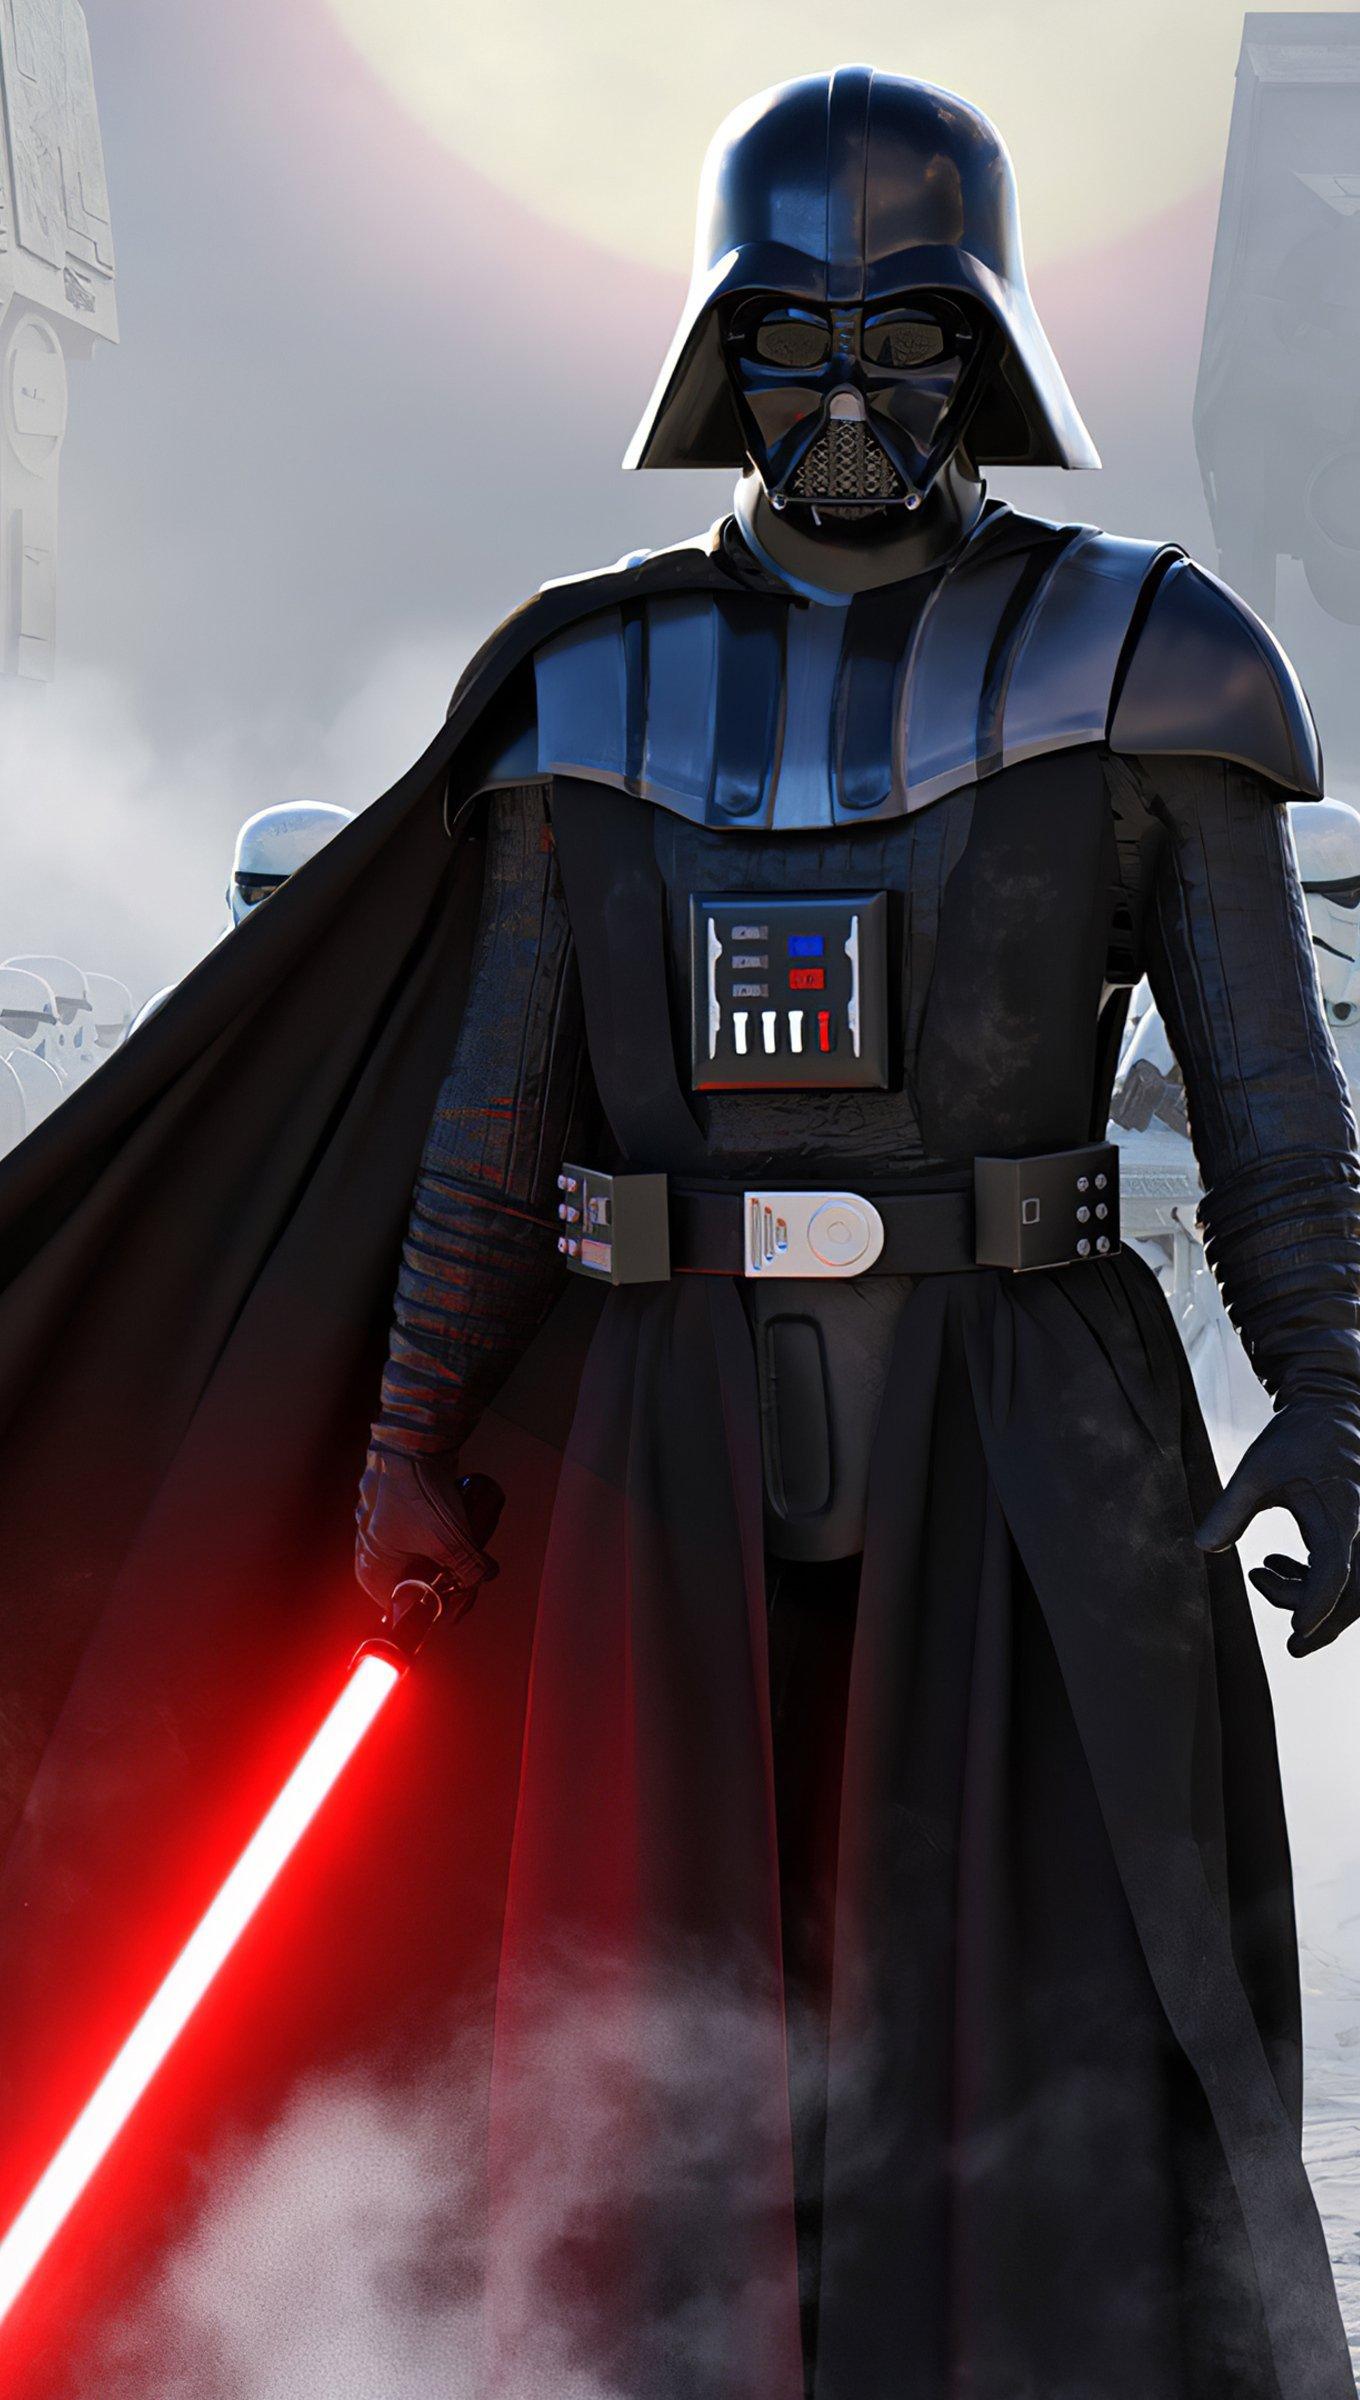 Fondos de pantalla Marcha Imperial Star Wars Vertical